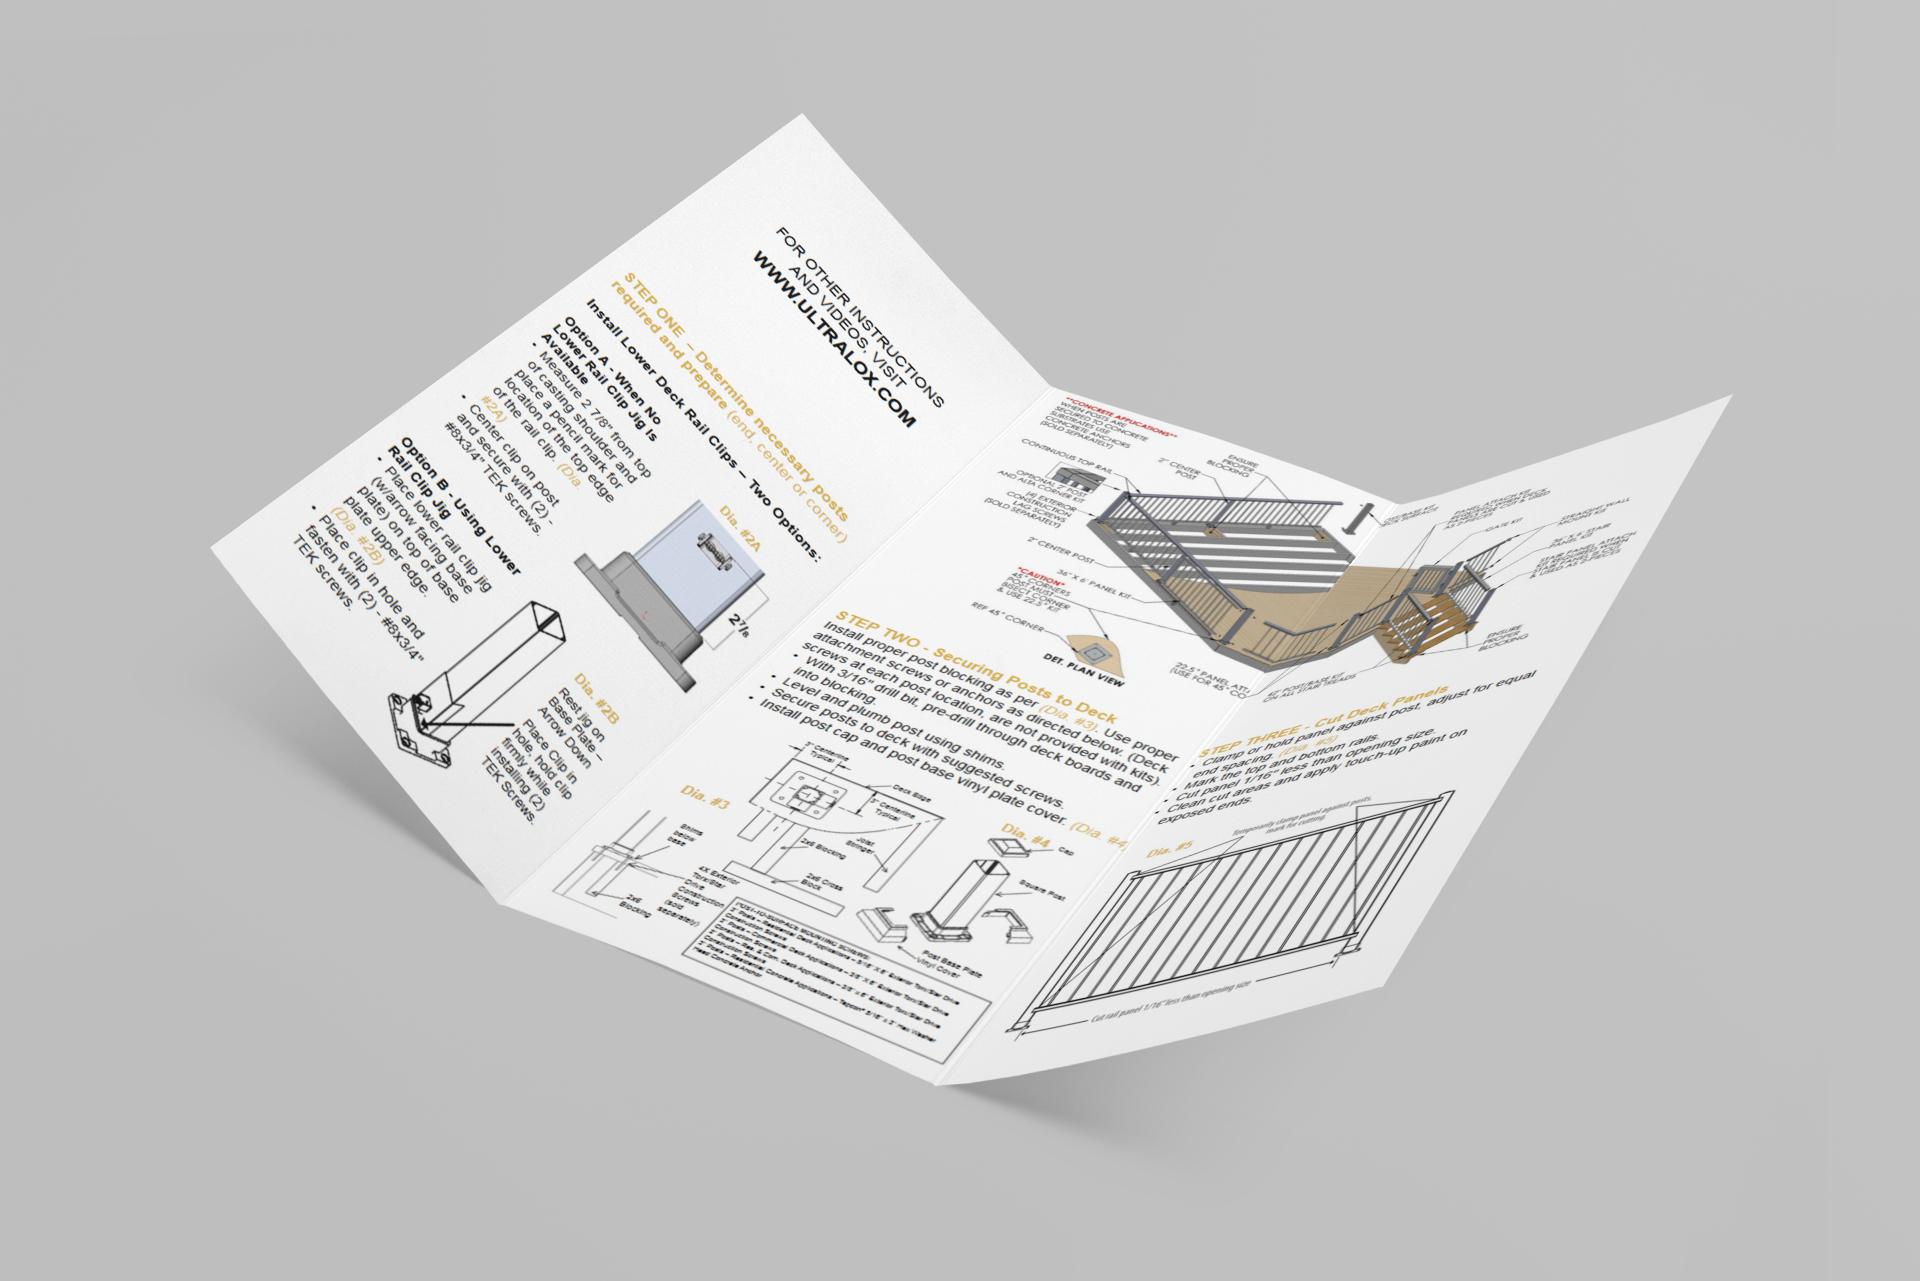 Inventiv Designs Instruction Design_0004_Layer 1